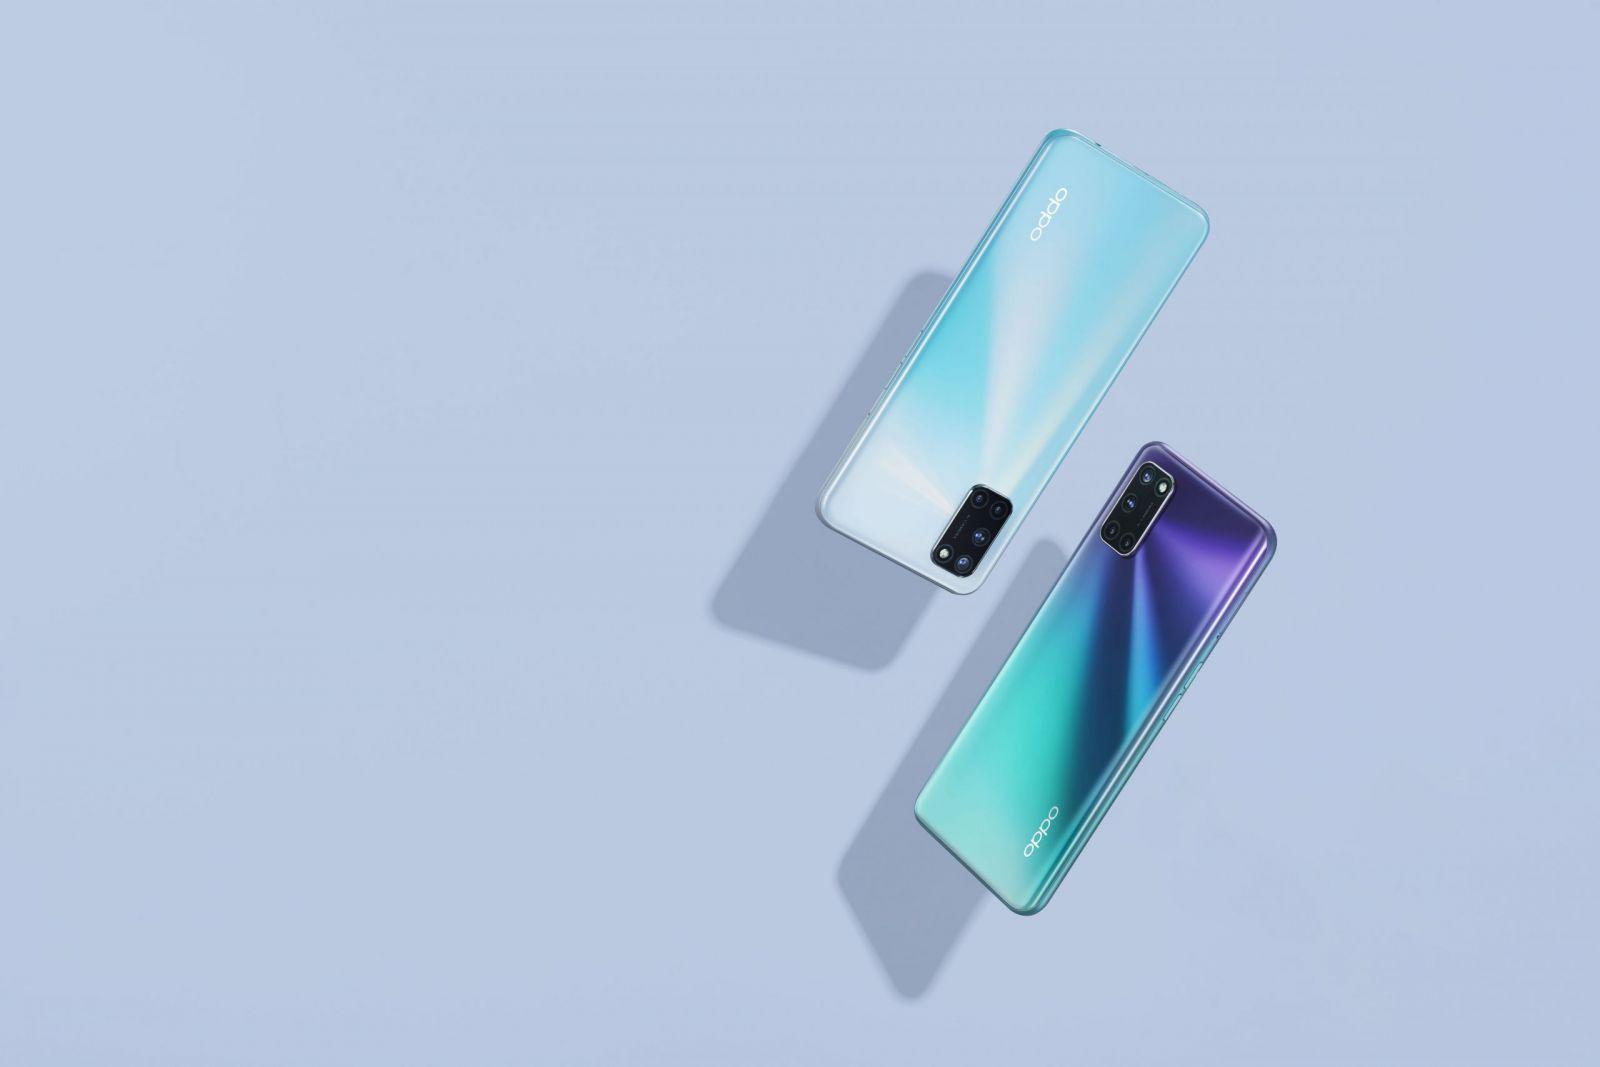 OPPO выпустила недорогой смартфон OPPO A72 с мощным аккумулятором (a72 scenario pictures 5 scaled)